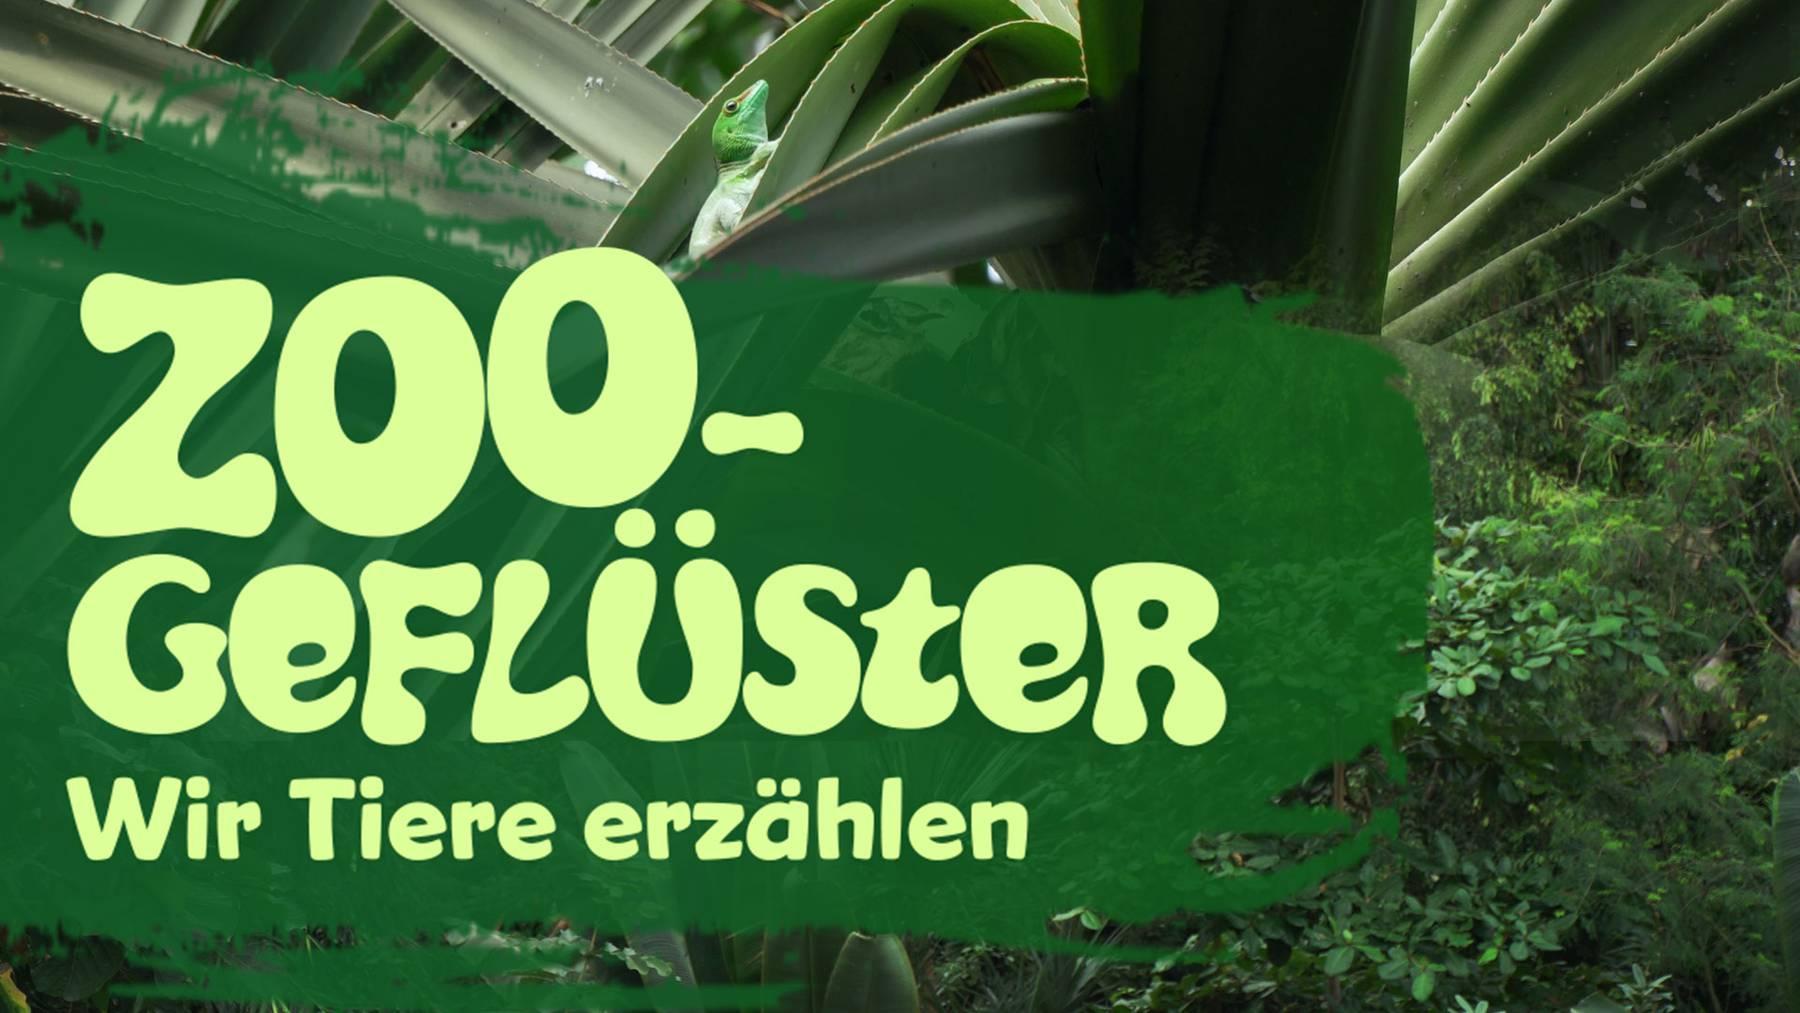 ZoogeflüsterHeader_green